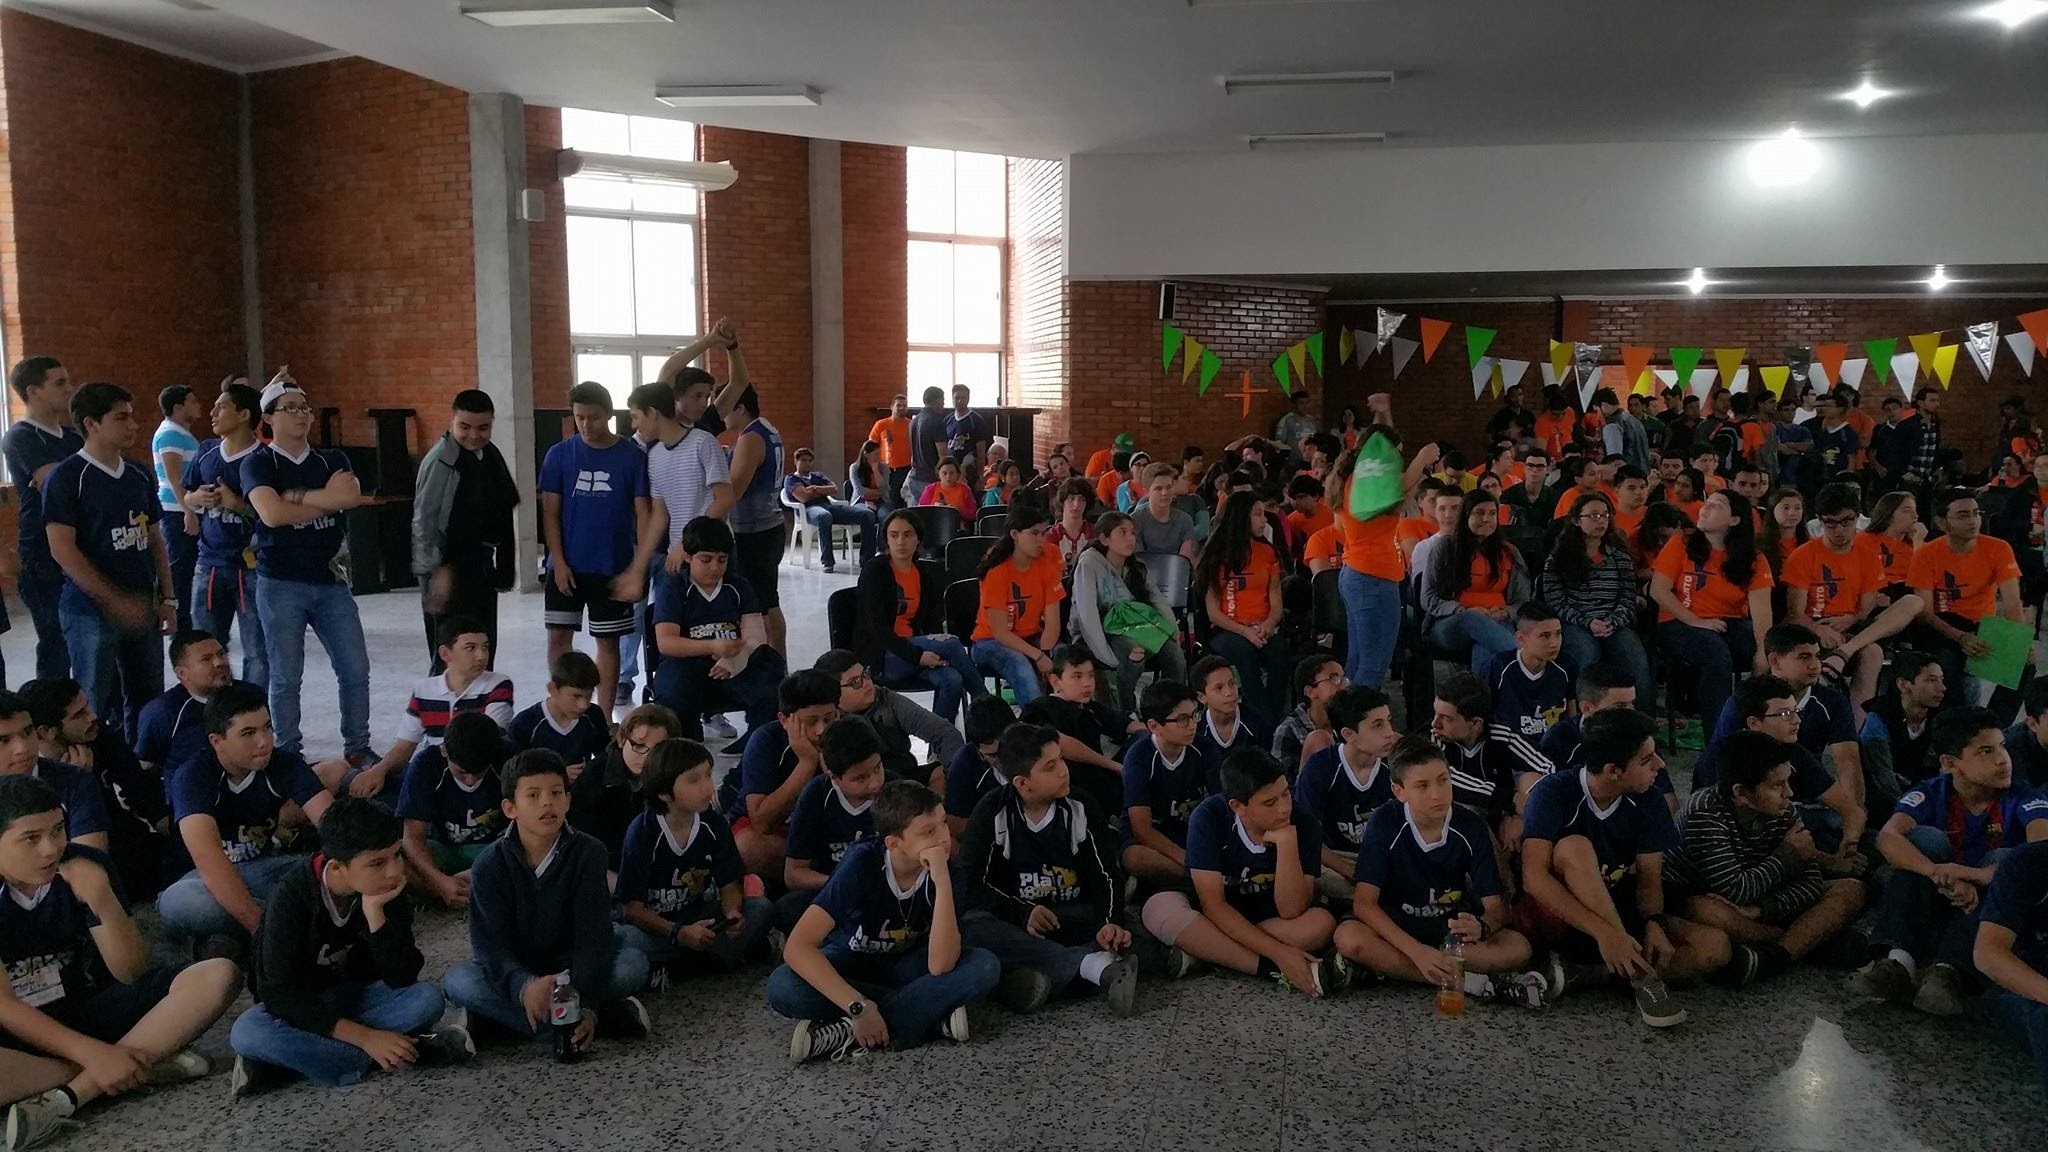 2016.01.4al8 - Conferencia Adolescentes en Tegucigalpa (Honduras) (9).jpg